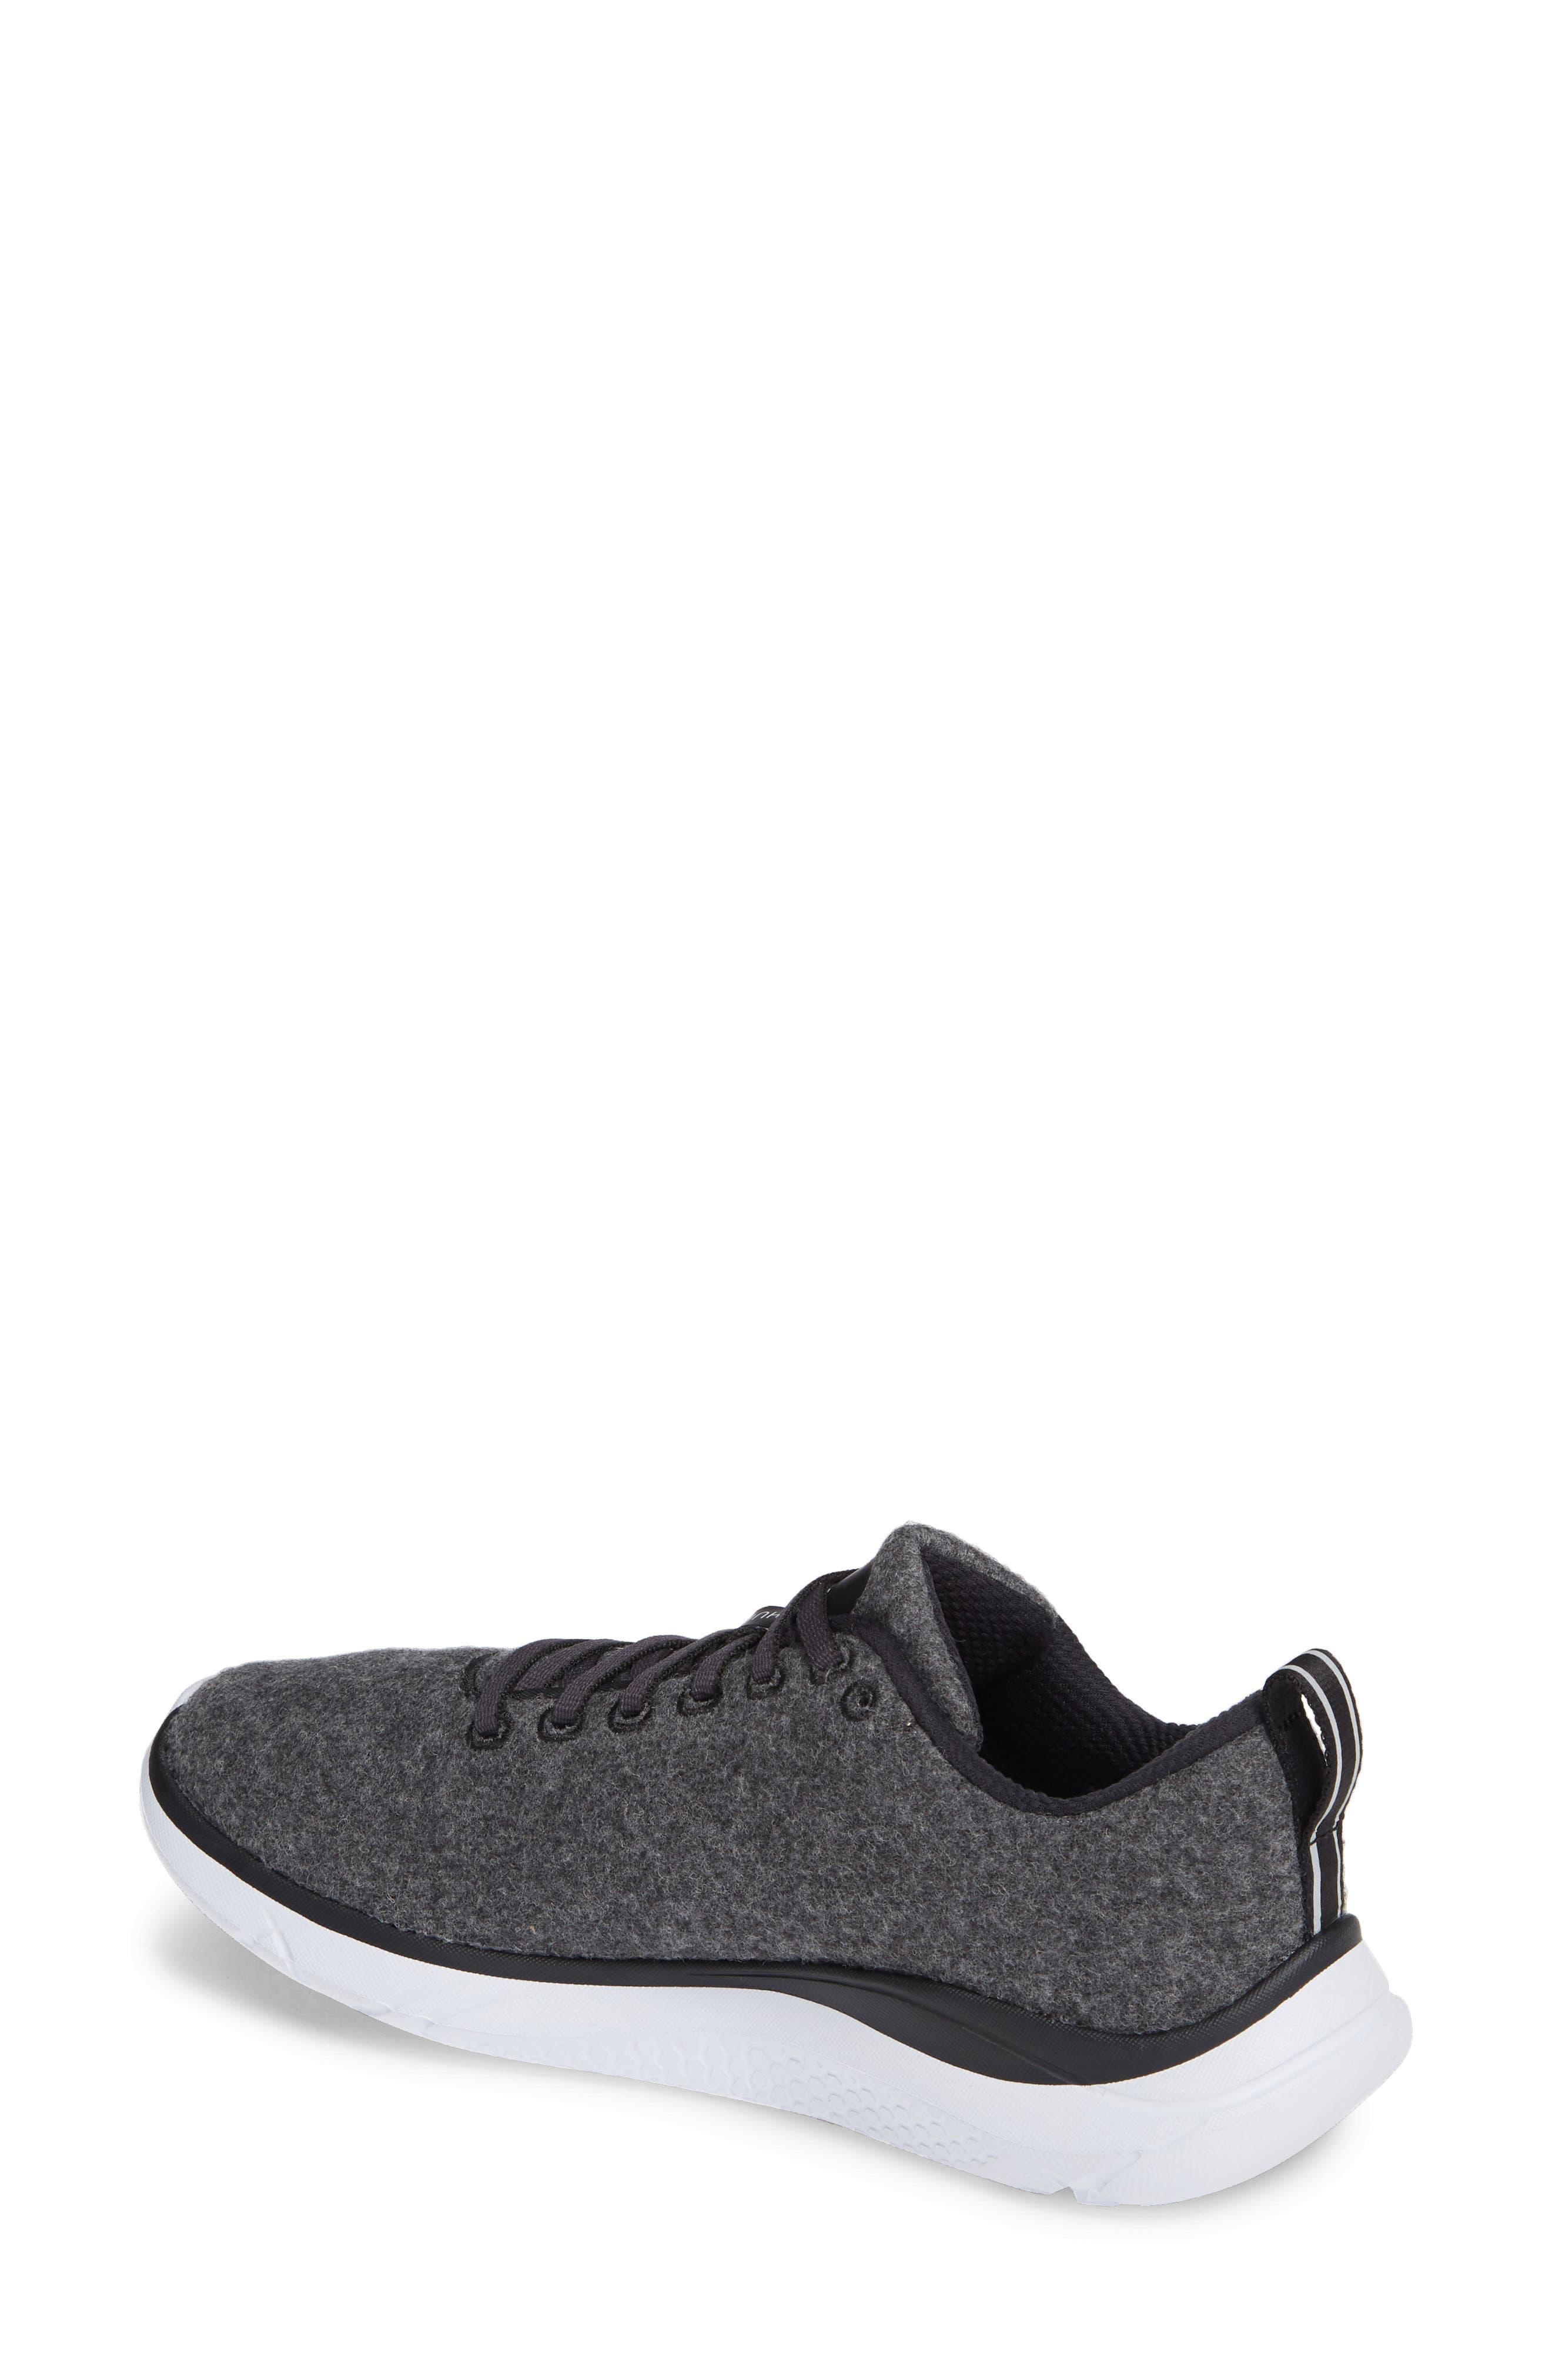 HOKA ONE ONE,                              Hupana Wool Sneaker,                             Alternate thumbnail 2, color,                             023